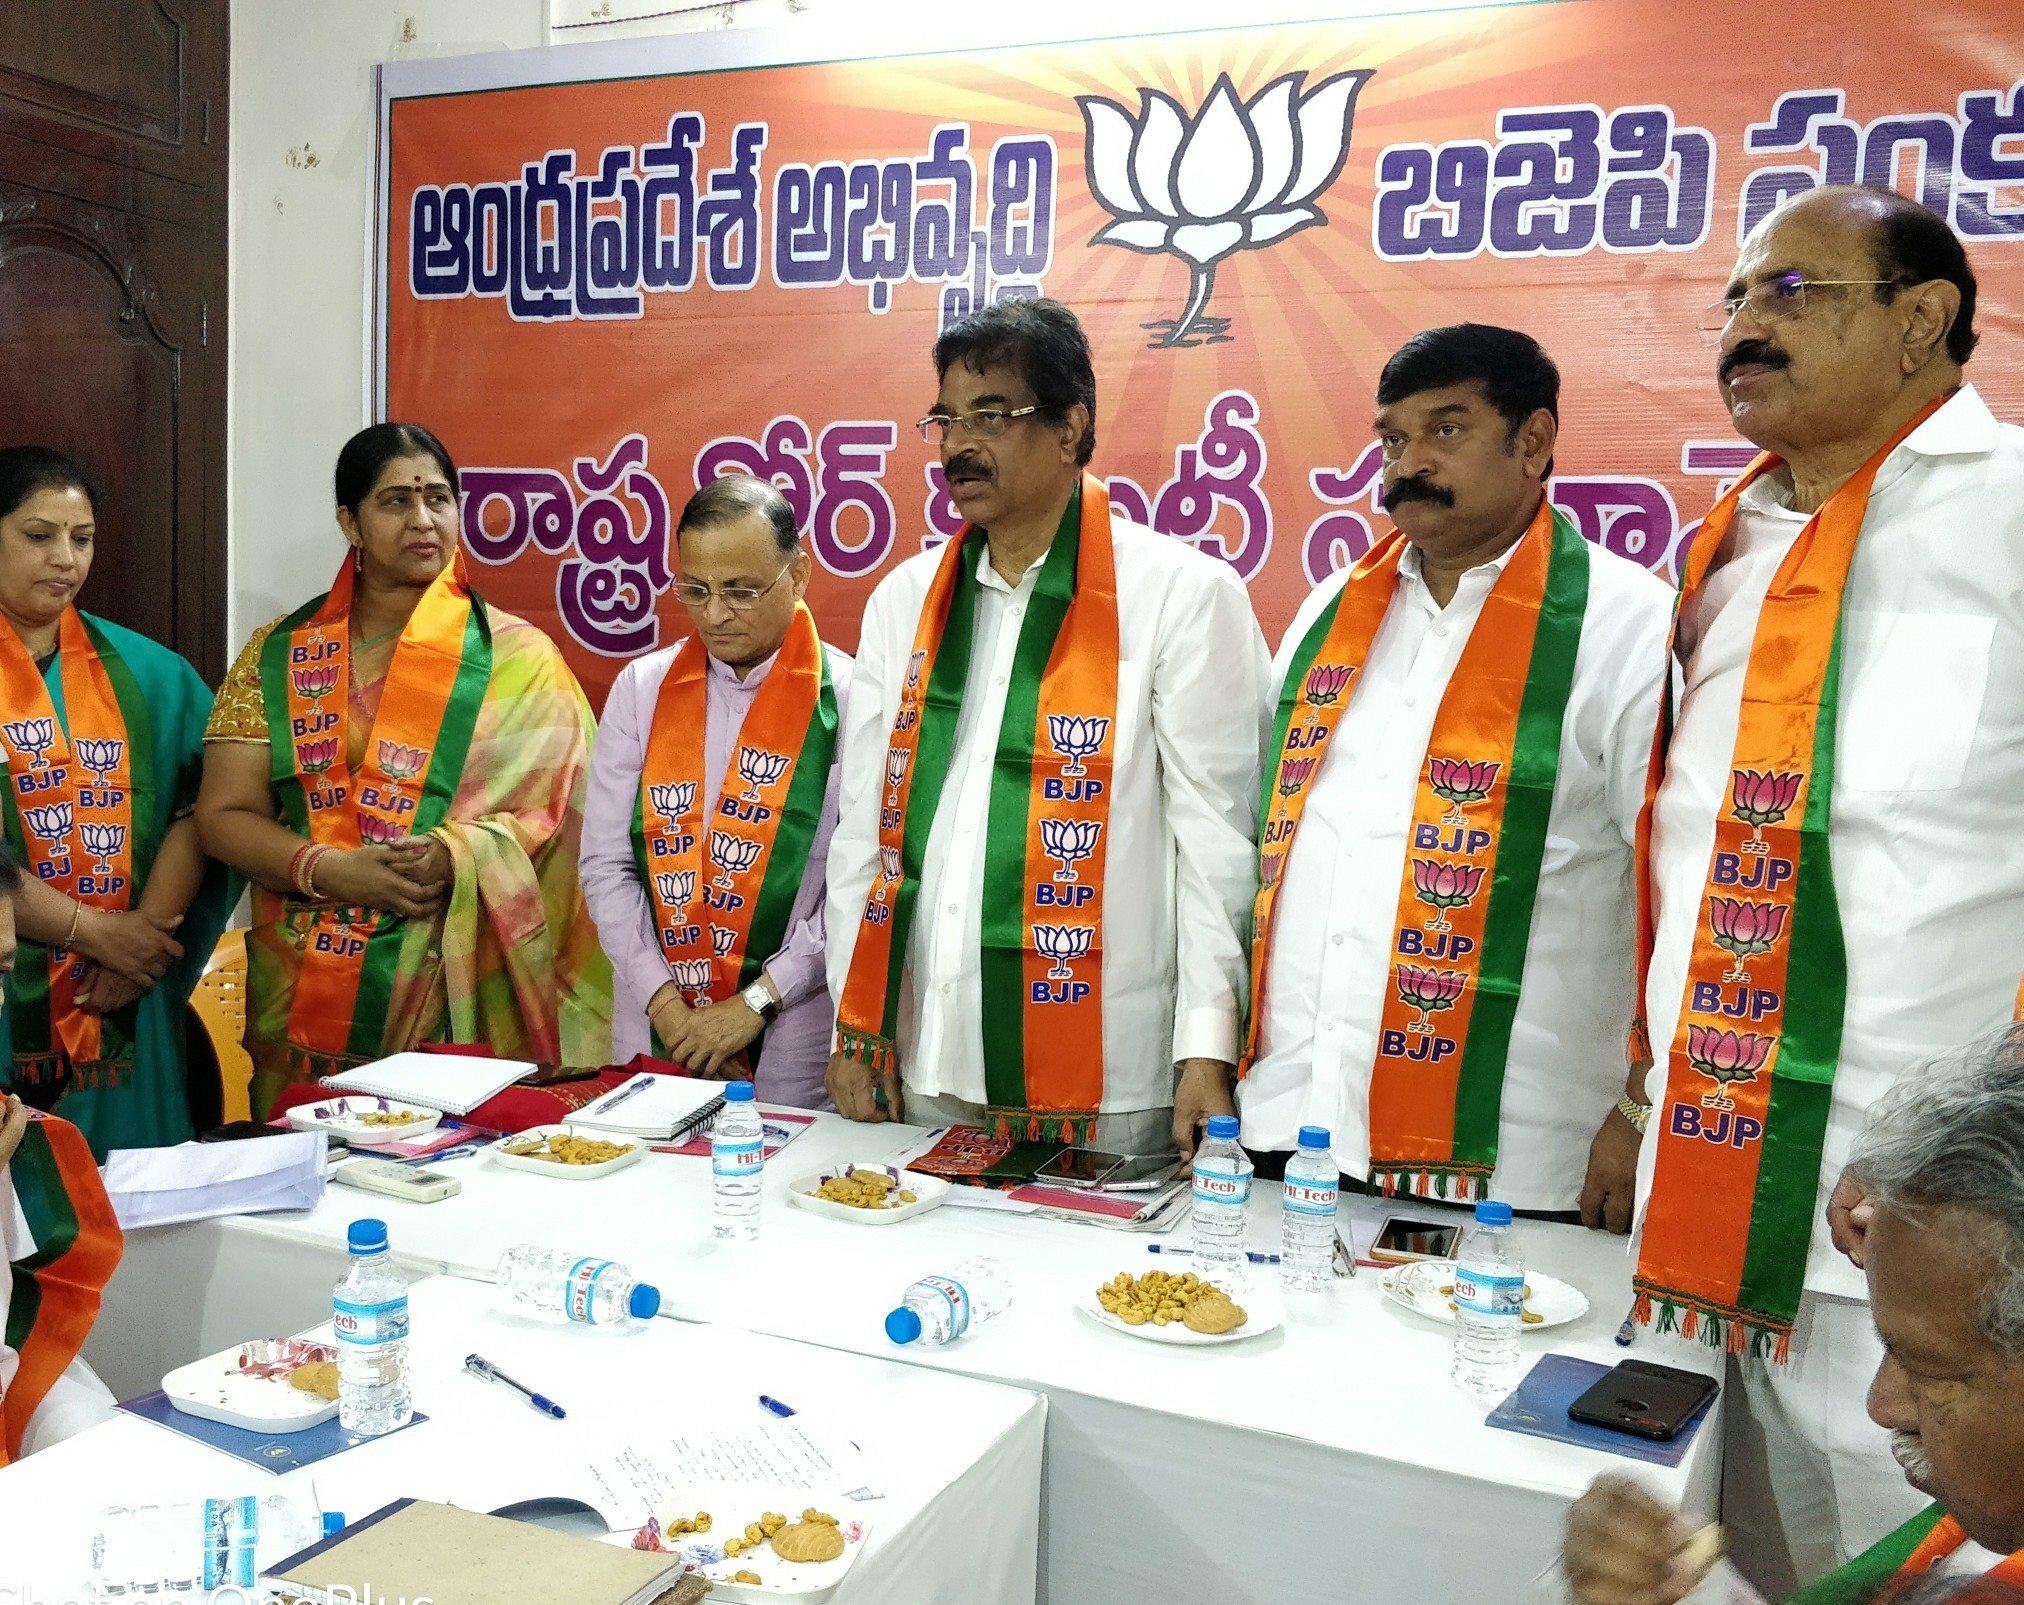 "BJP ANDHRA PRADESH on Twitter "" Actress & Ex TDP leader Smt Kavitha Garu joined BJP today She said reforms of Shri narendramodi Ji central govts"